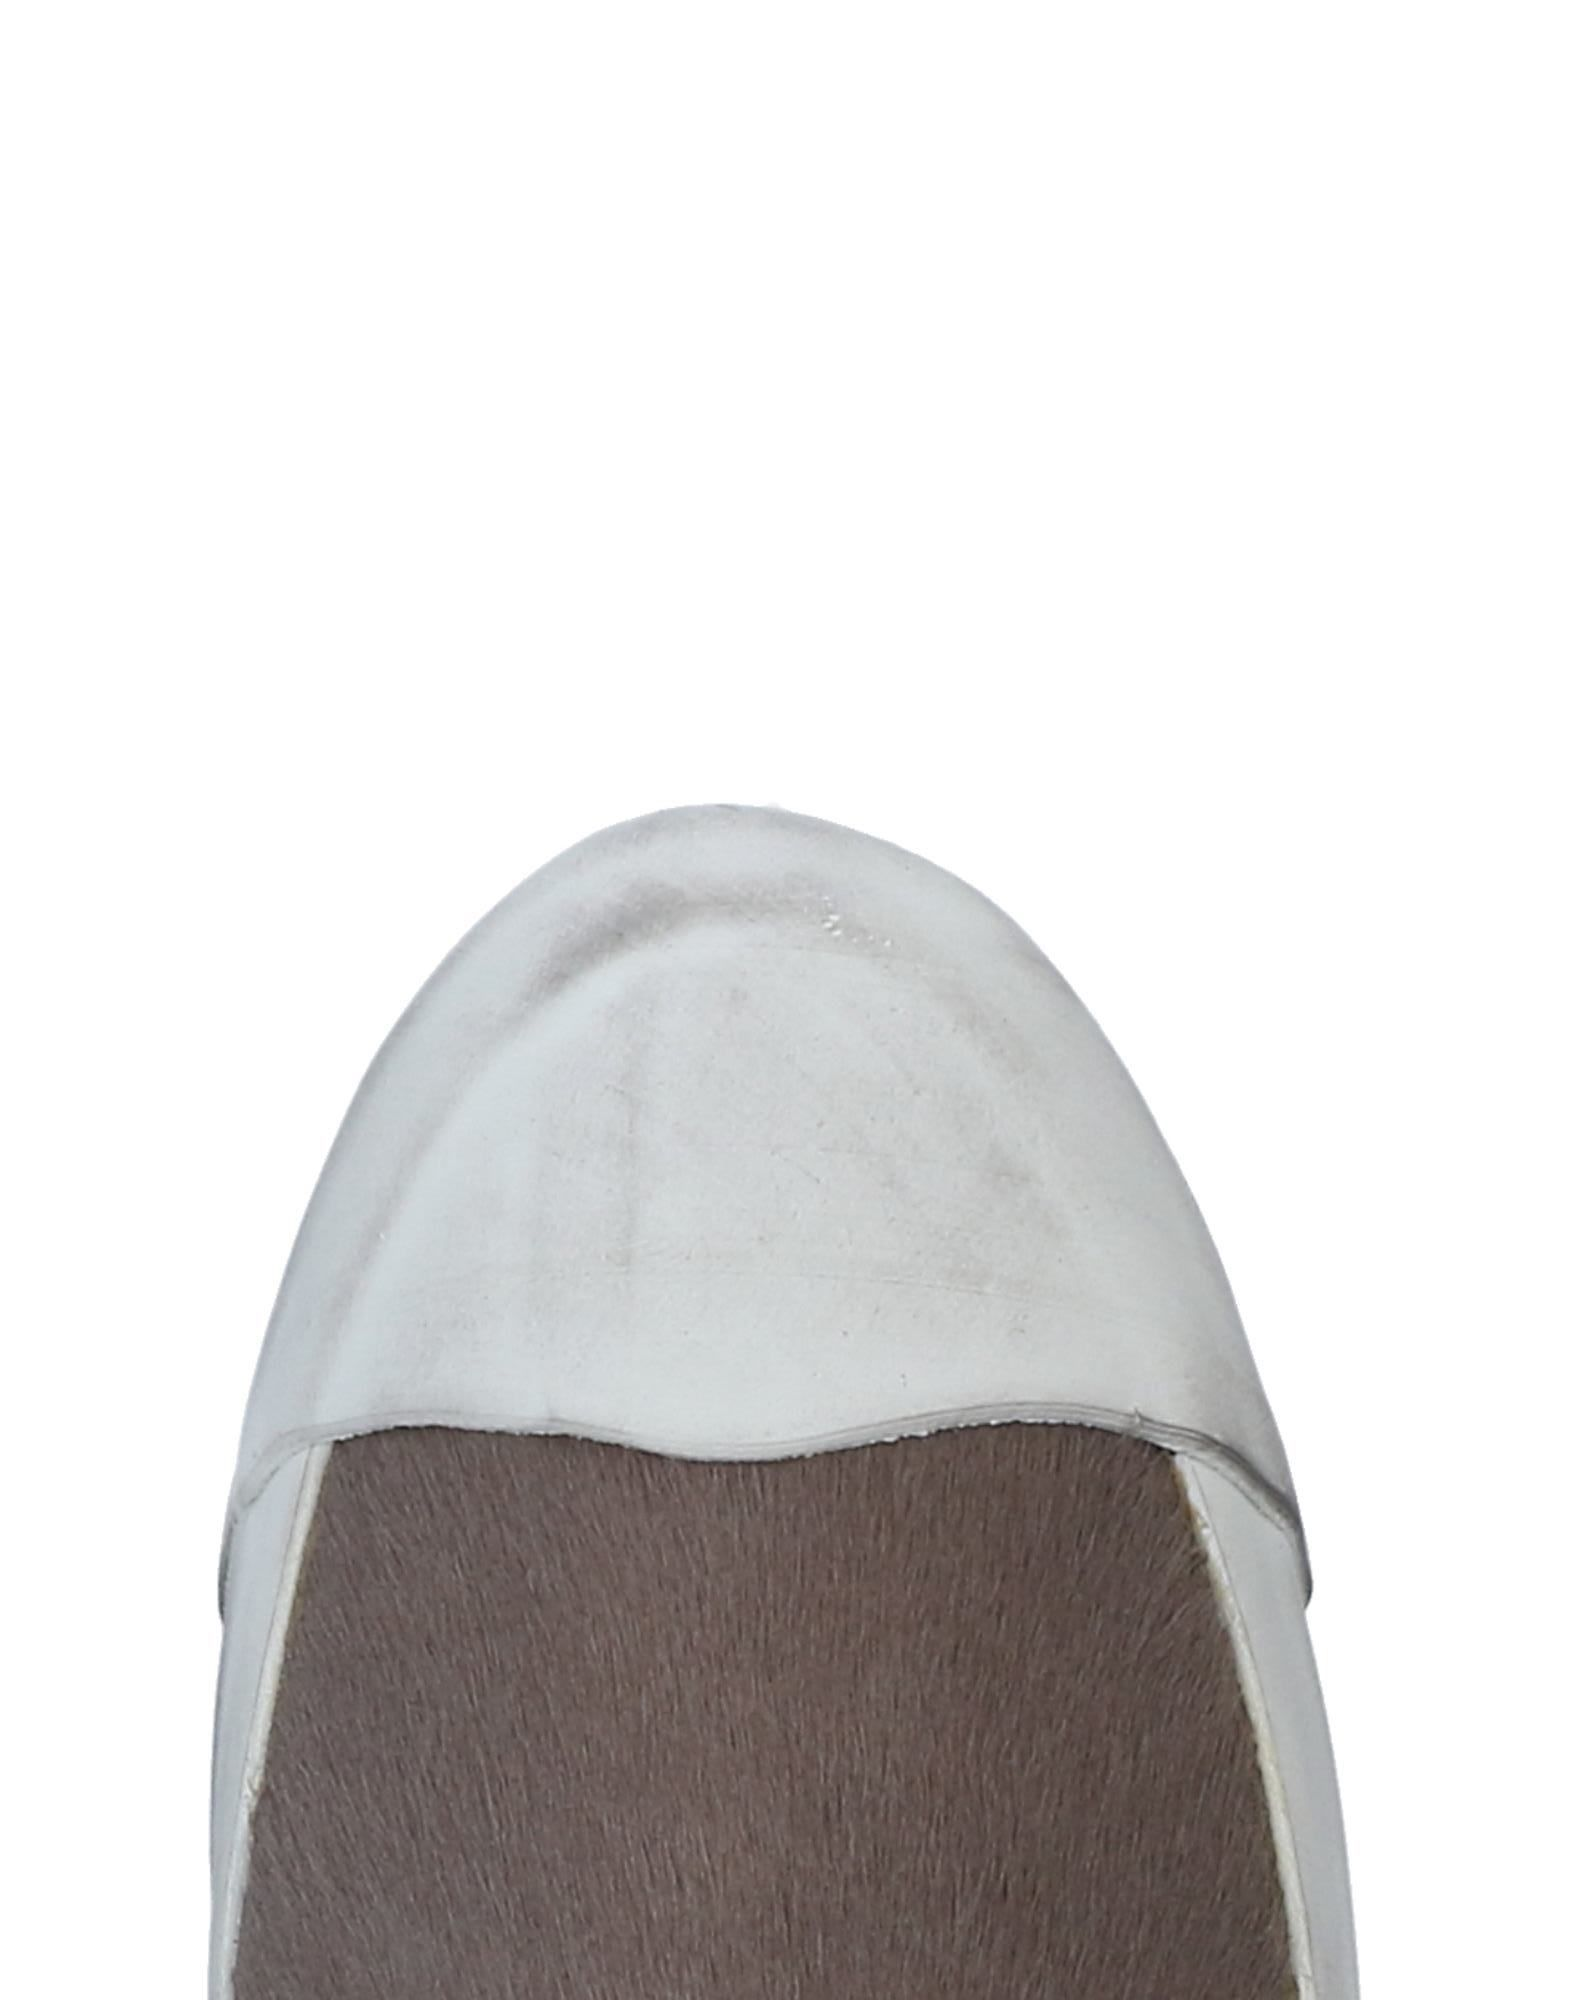 O.X.S. Gute Sneakers Damen  11456650PQ Gute O.X.S. Qualität beliebte Schuhe 87ab12